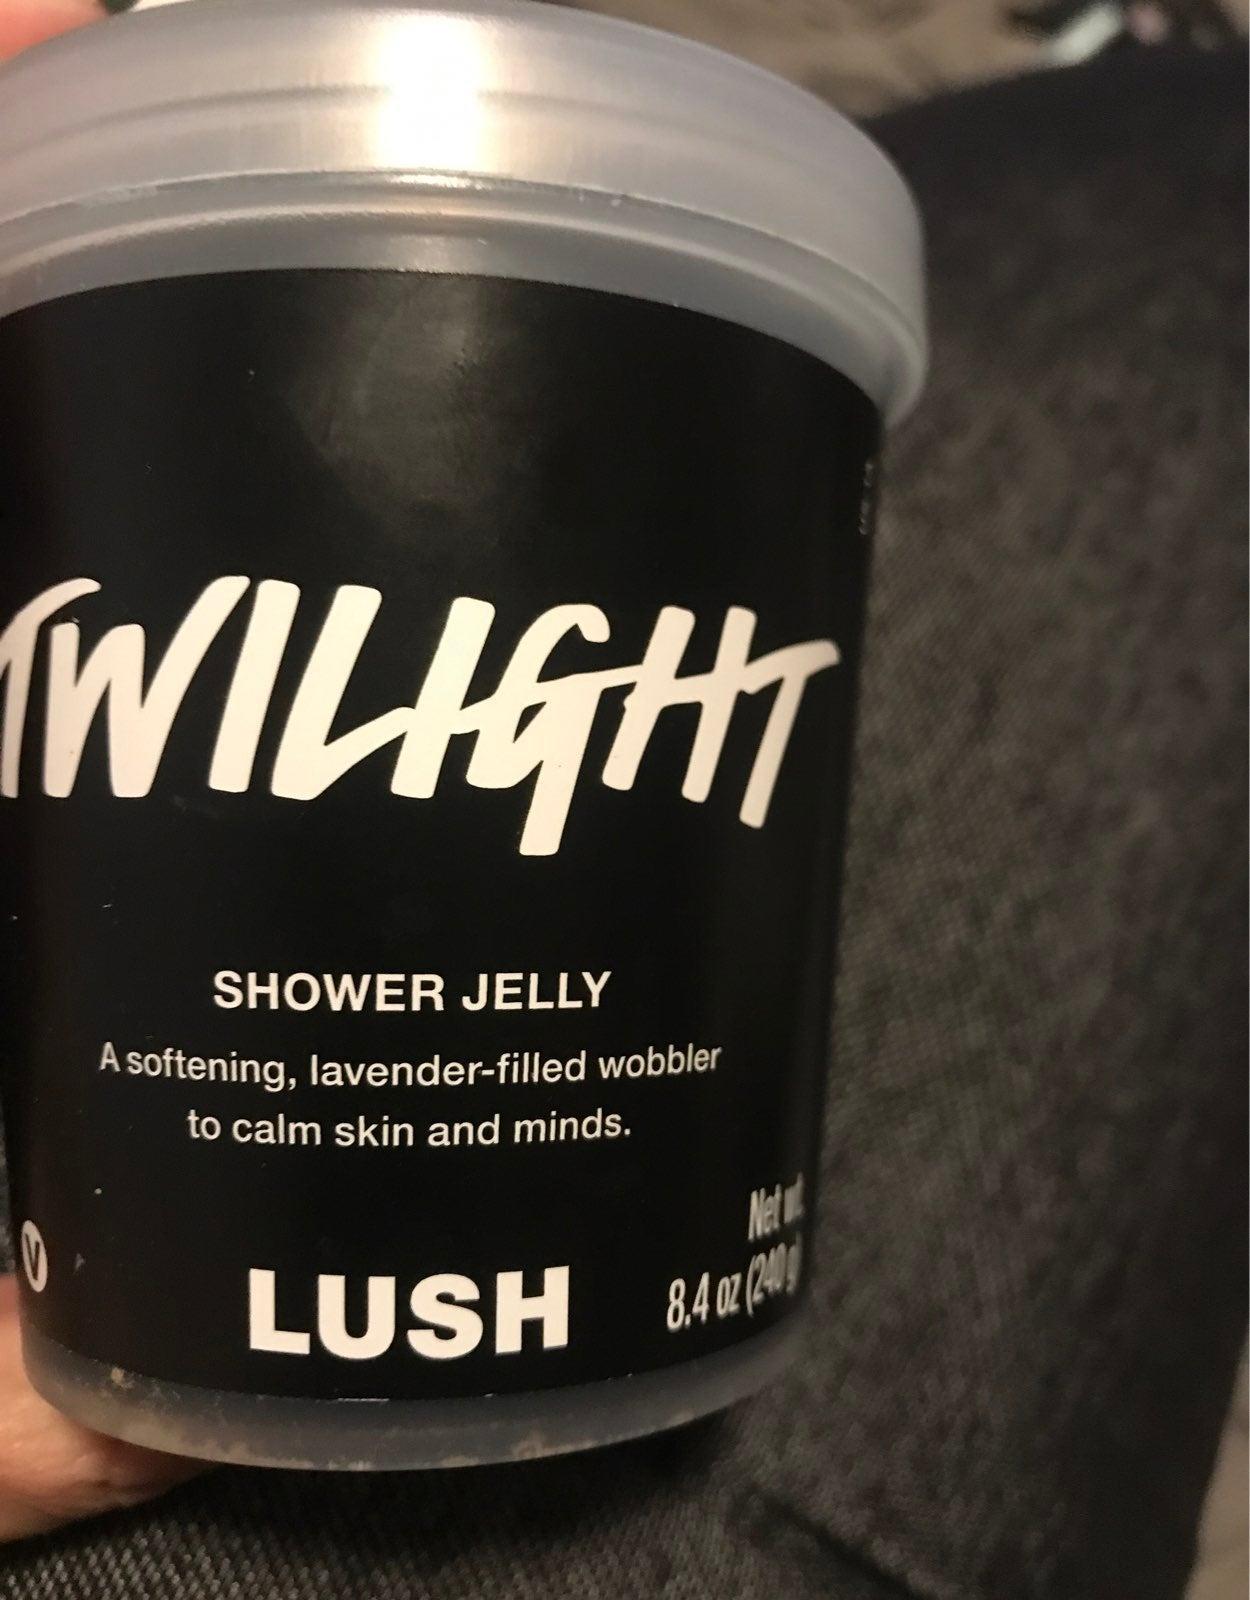 Lushtwilight shower jelly new